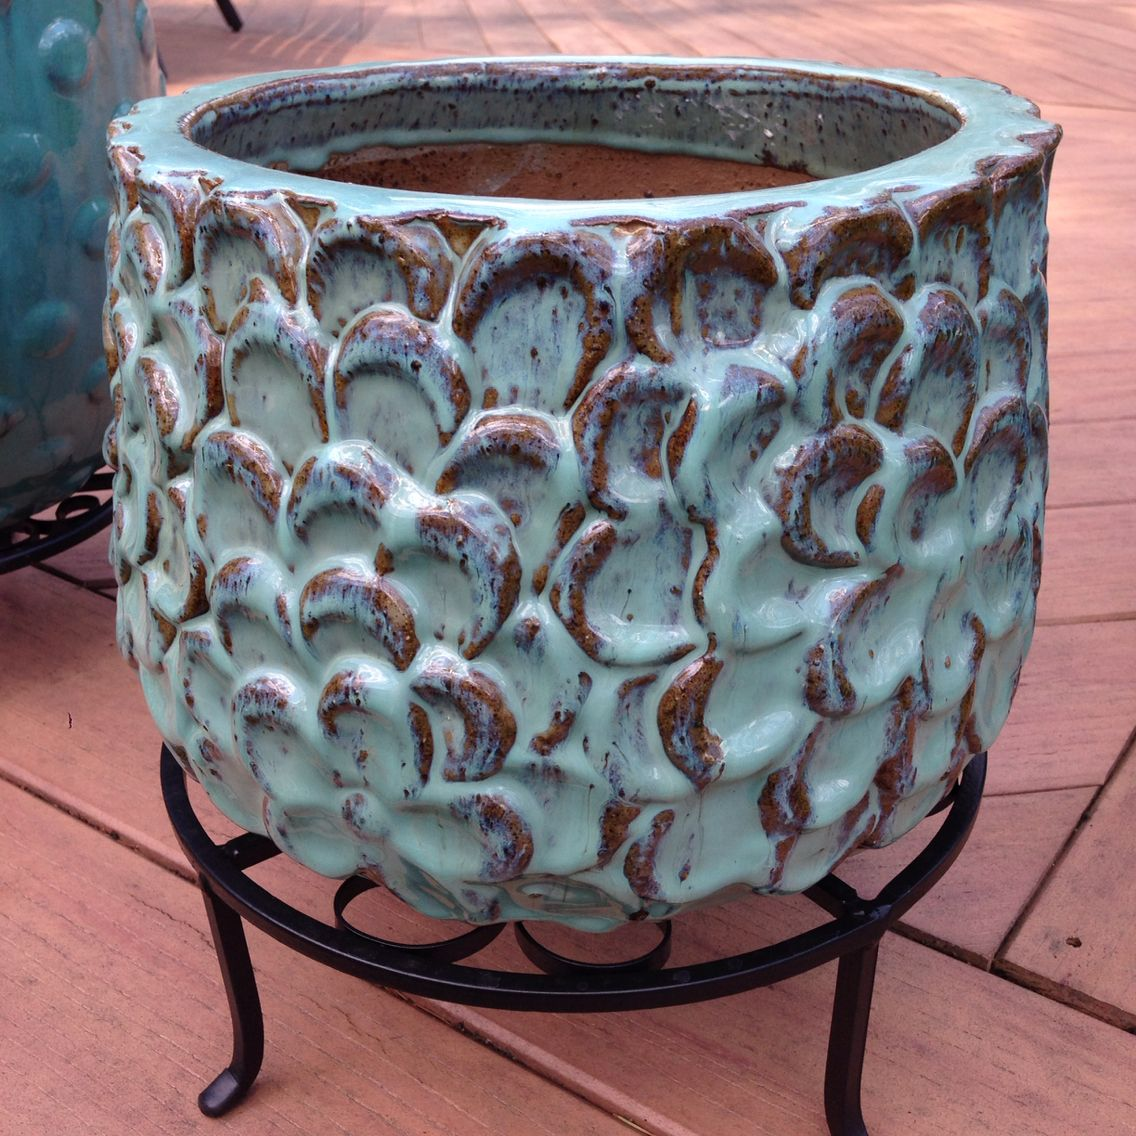 Nicole Miller Home Planter From Home Goods 16 99 Vasi